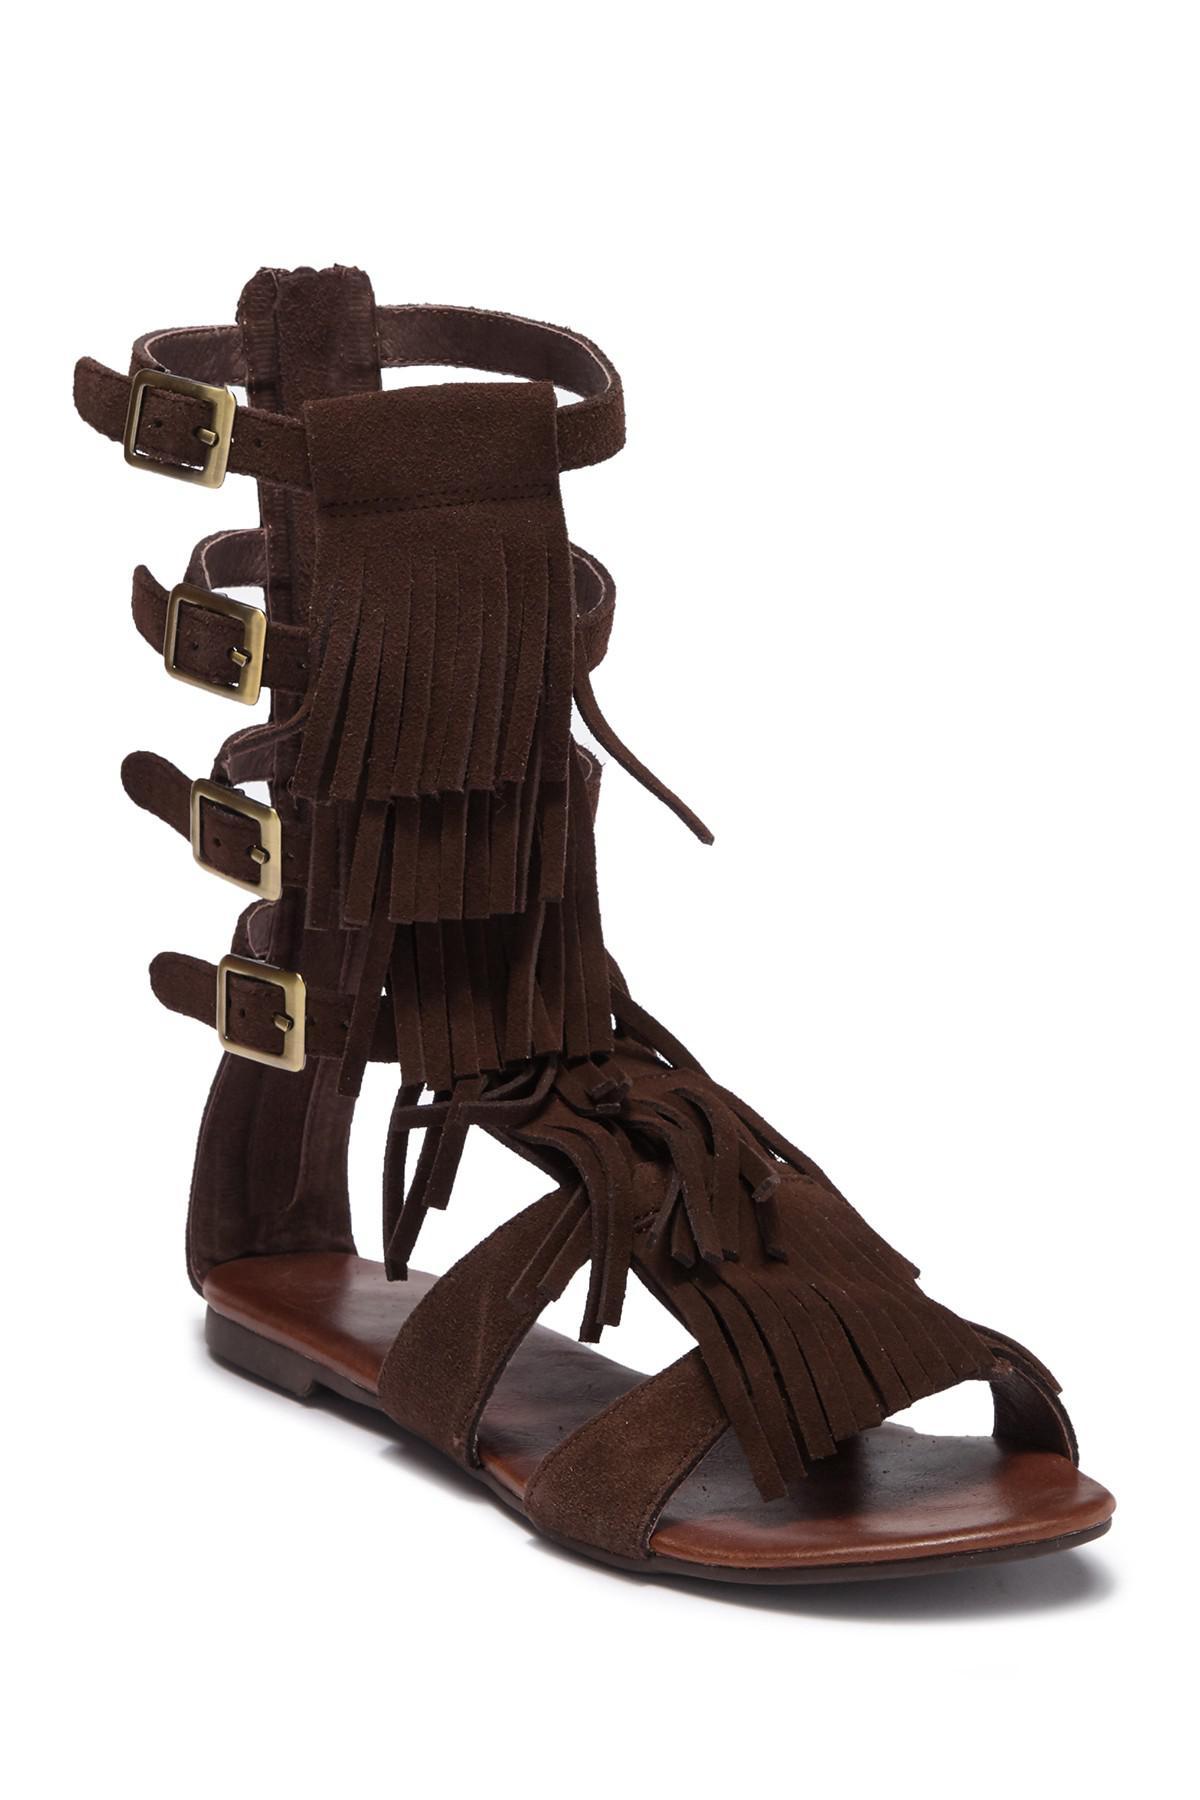 8c7ecd8b4c23 Lyst - Jeffrey Campbell Top Fringe Sandal in Brown